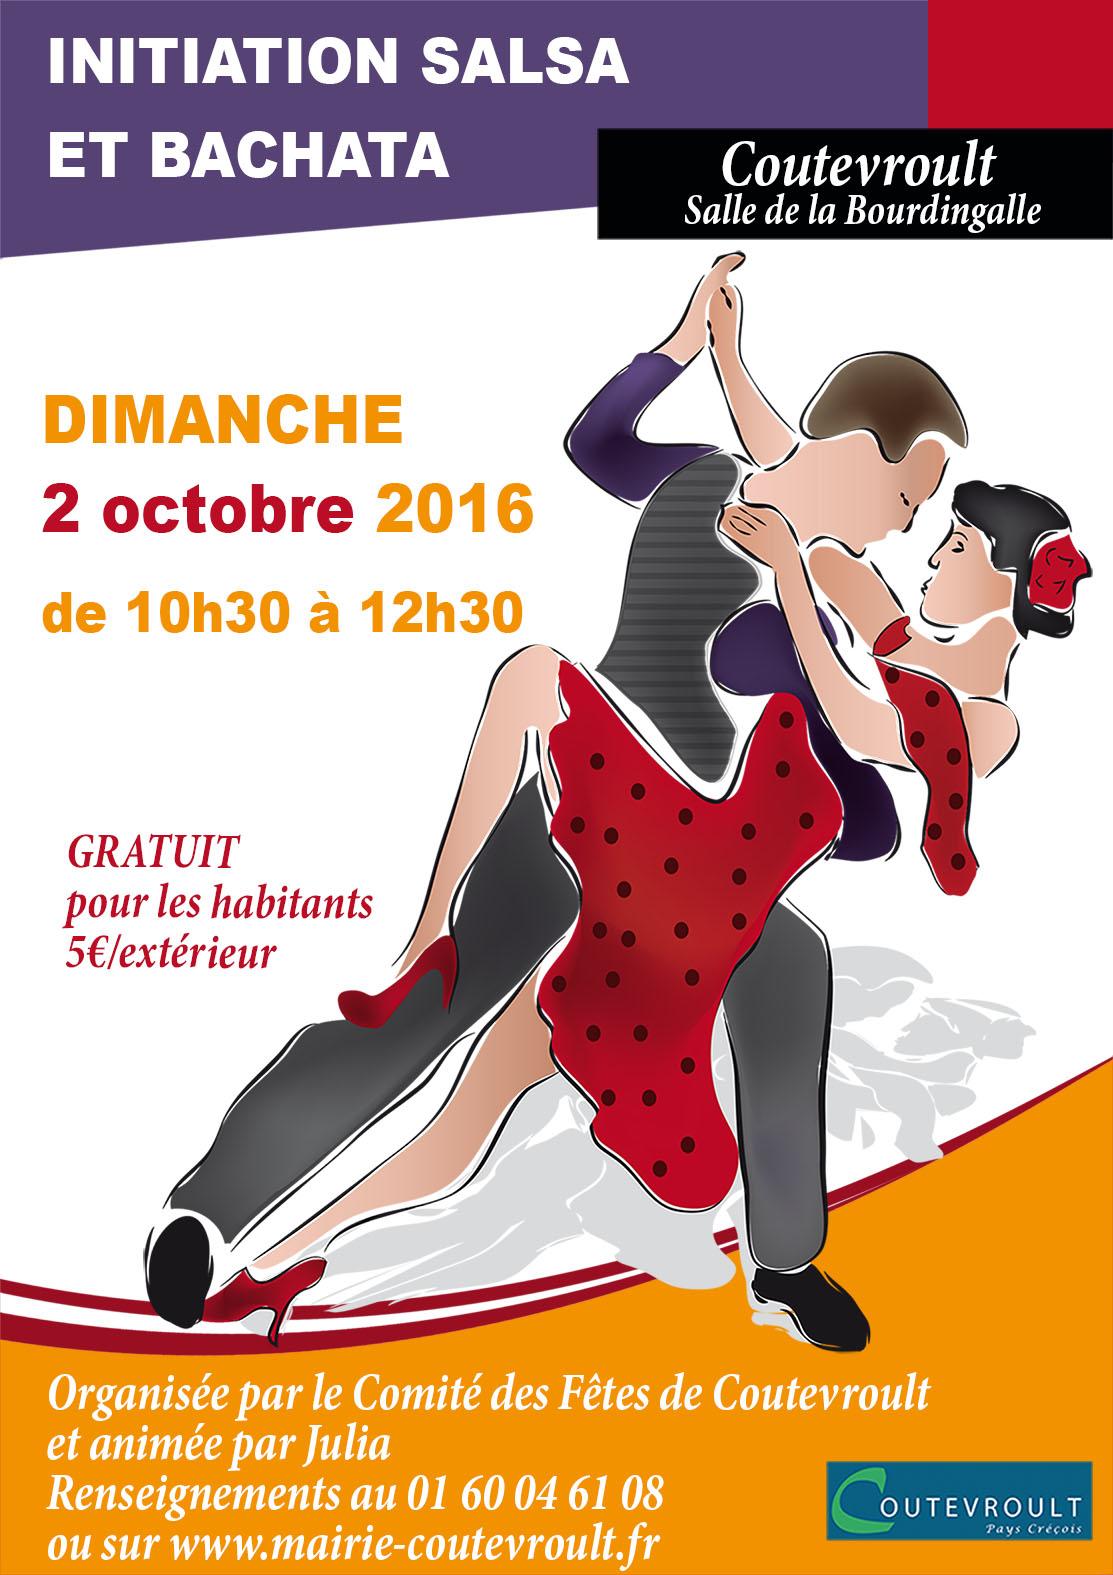 Initiation salsa & bachata : dimanche 2 octobre 2016